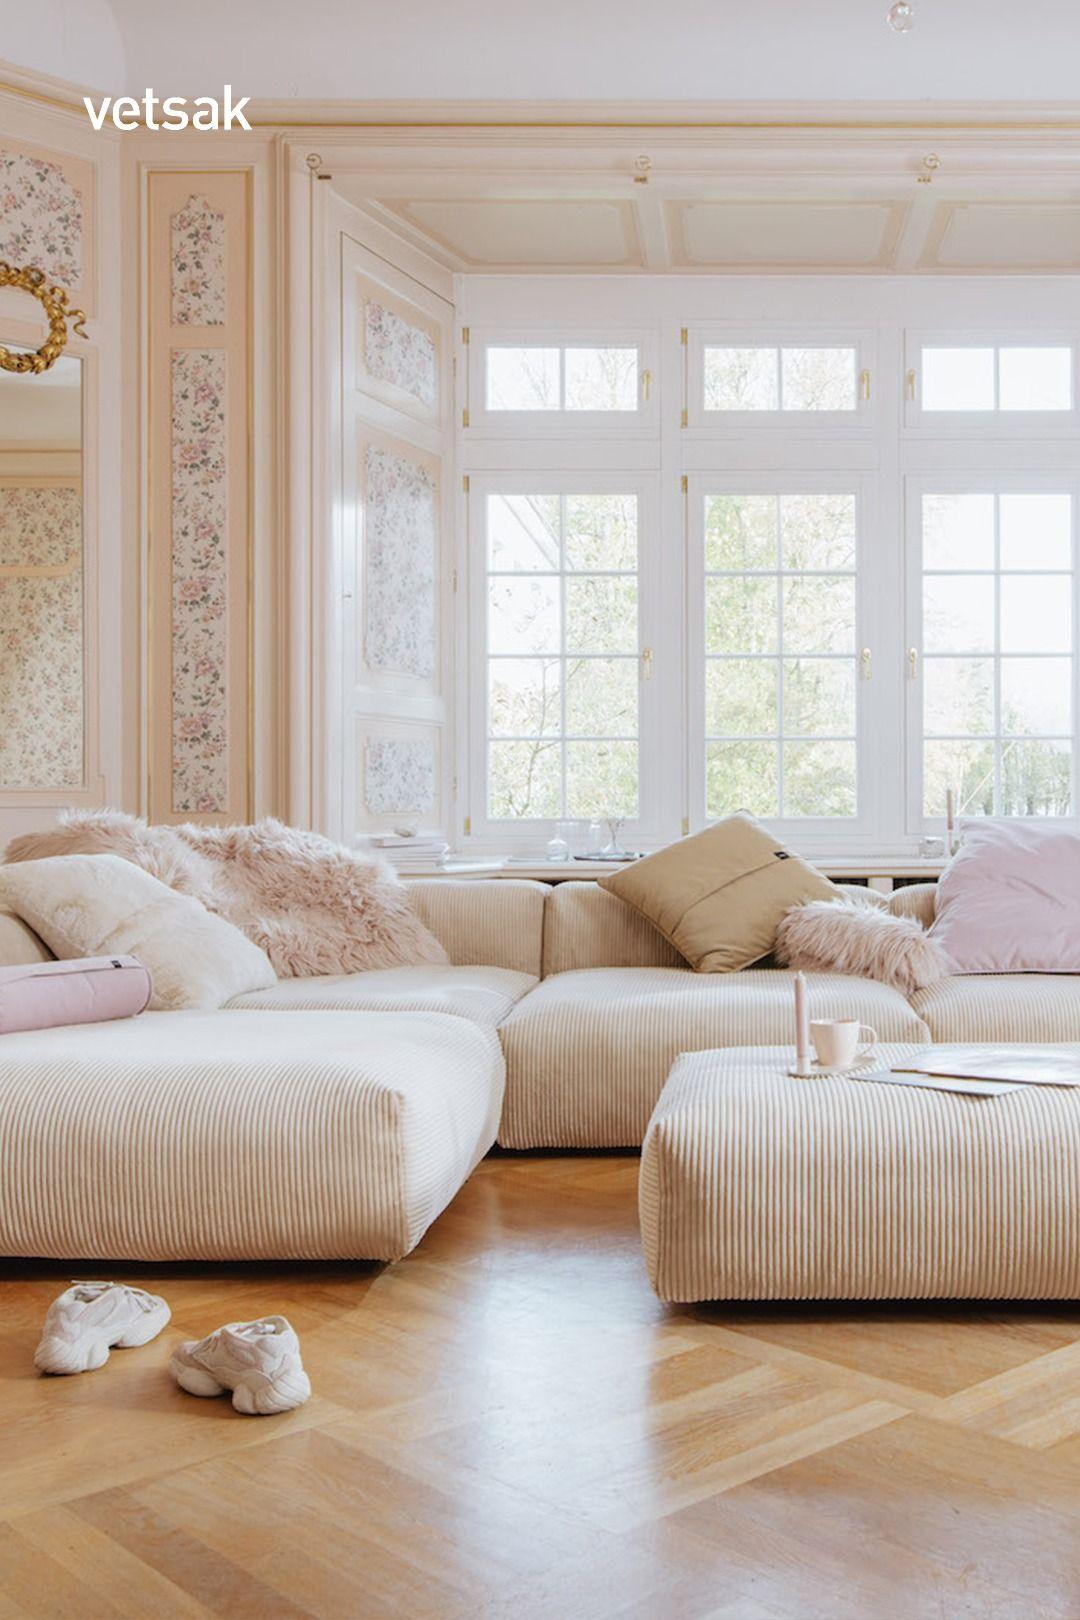 Sofa 2 Large 2 Medium 3 Side Cord Velours Sand Wohnzimmer Einrichten Ideen Wohnzimmer Einrichten Wohnzimmer Ideen Wohnung